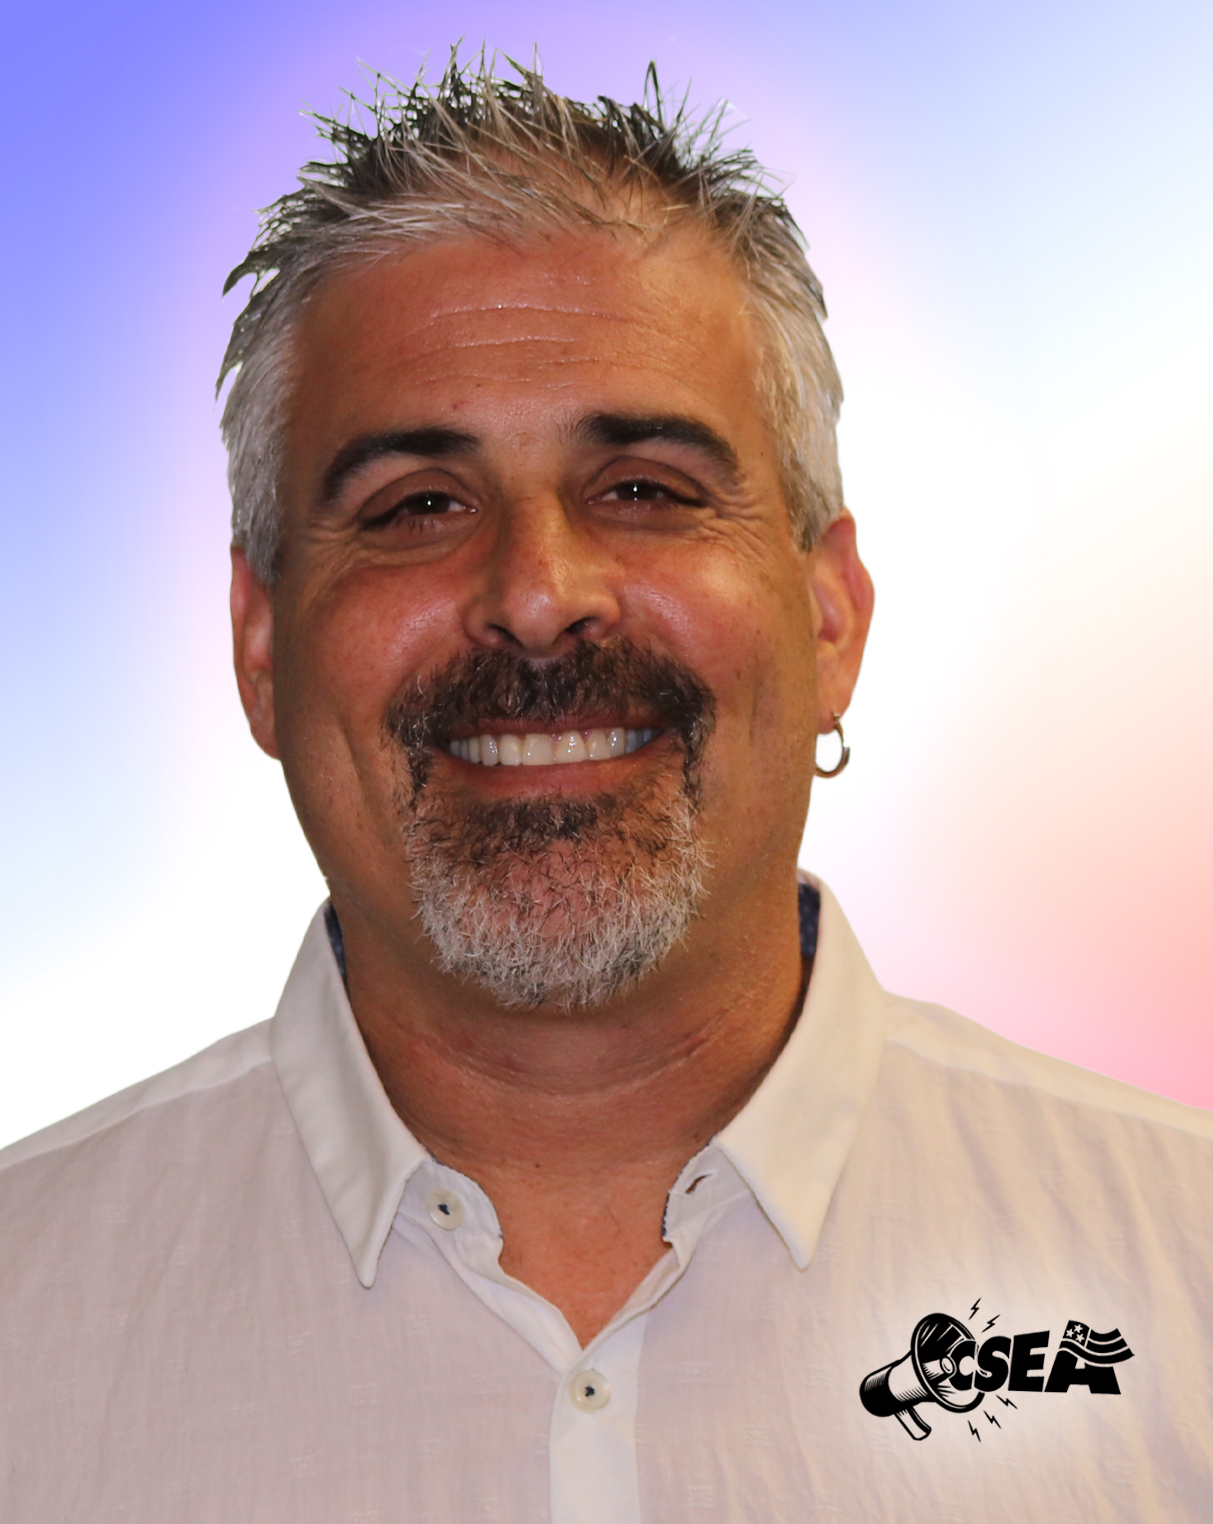 RichardDopkin - CSEA Local 830 Vice President